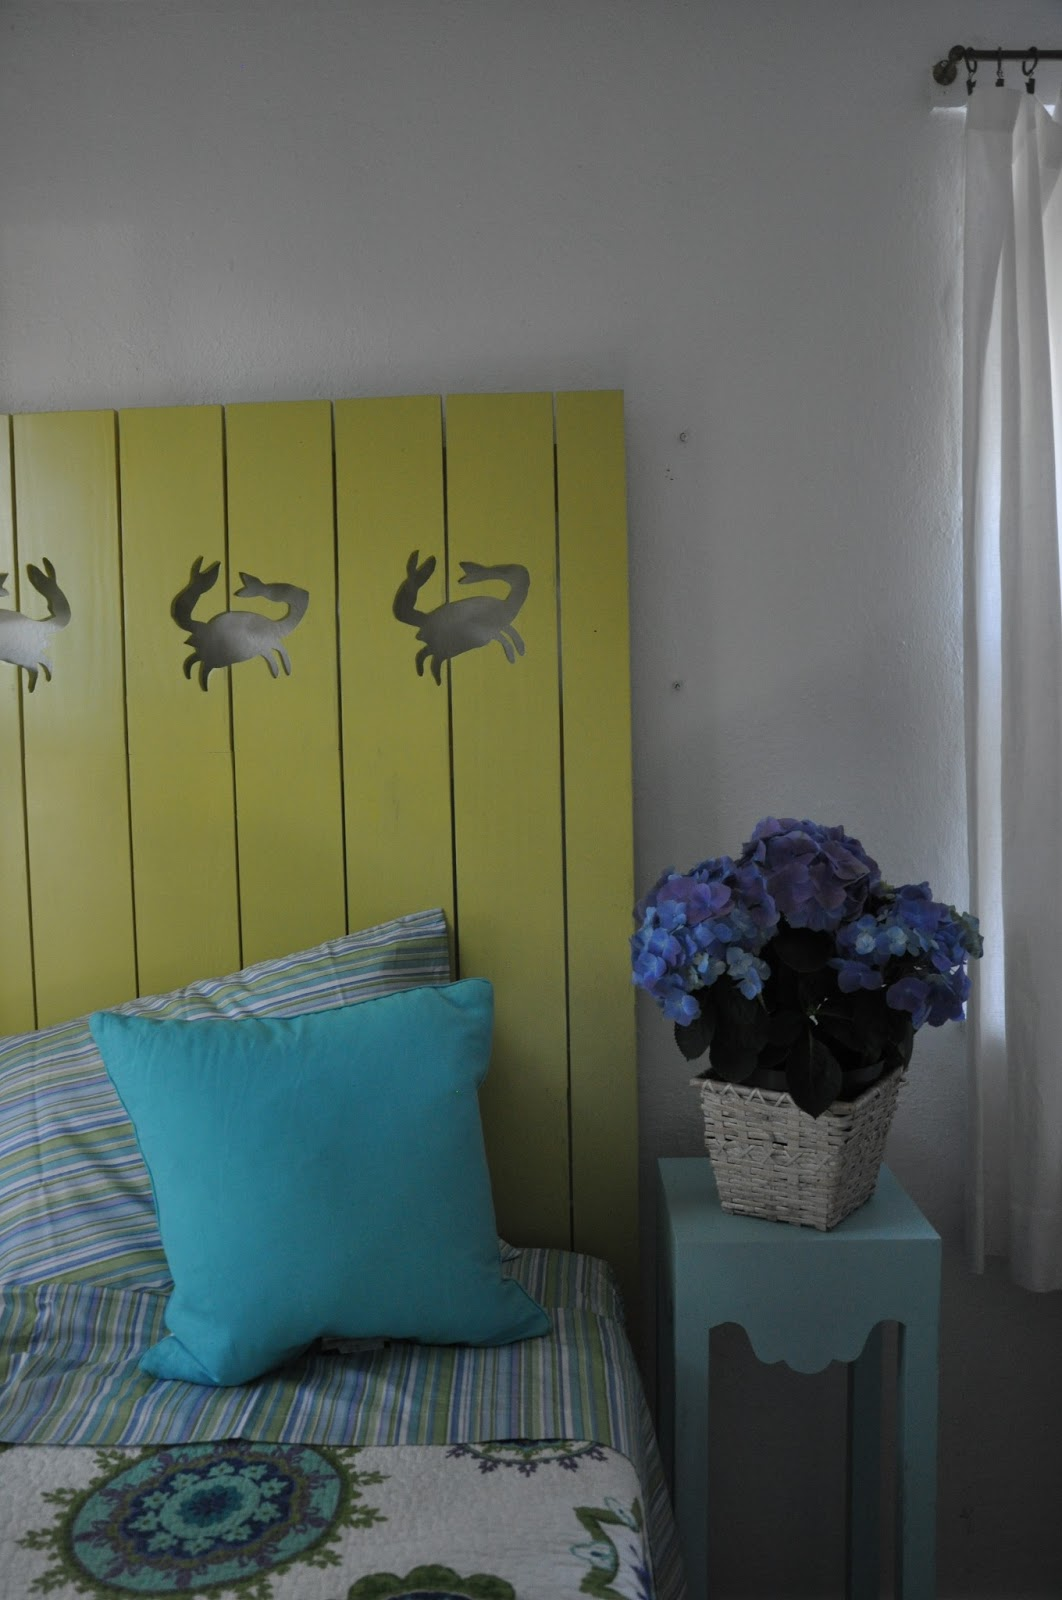 Jane Coslick Cottages My Favorite Bedroom And More: Jane Coslick Cottages : And Speaking Of Beds